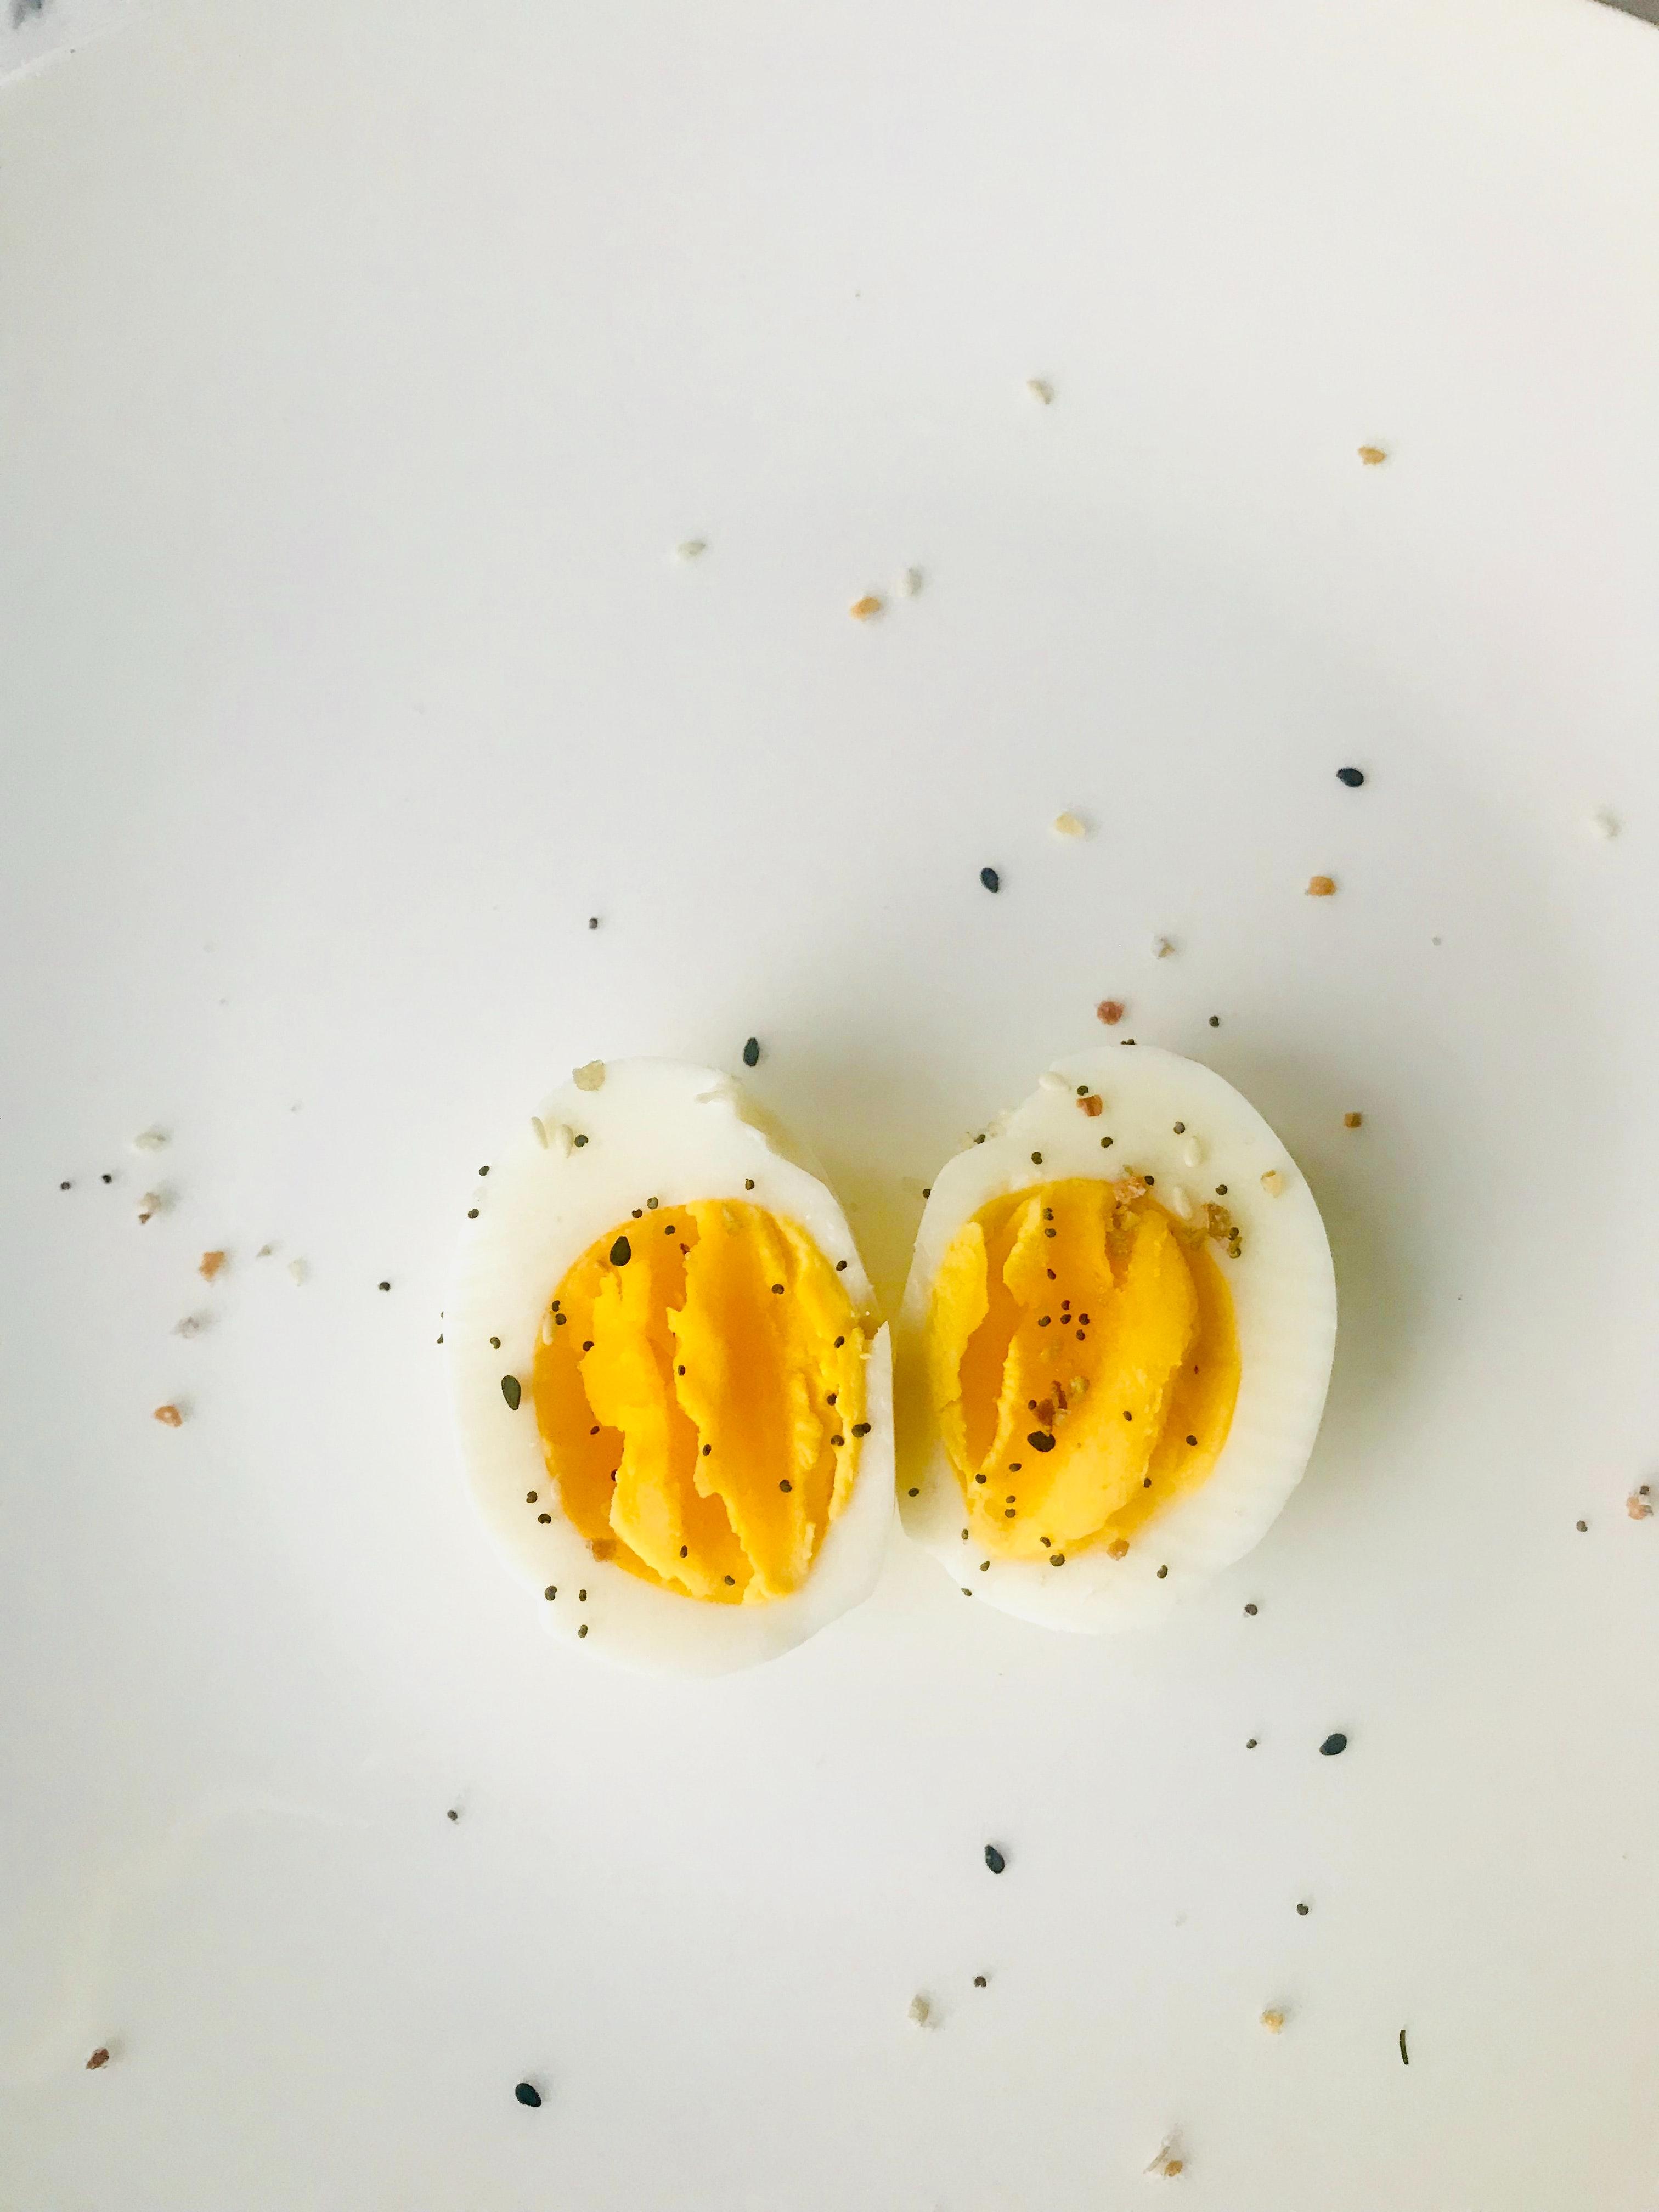 Slice Of Eggs On Cakes 183 Free Stock Photo